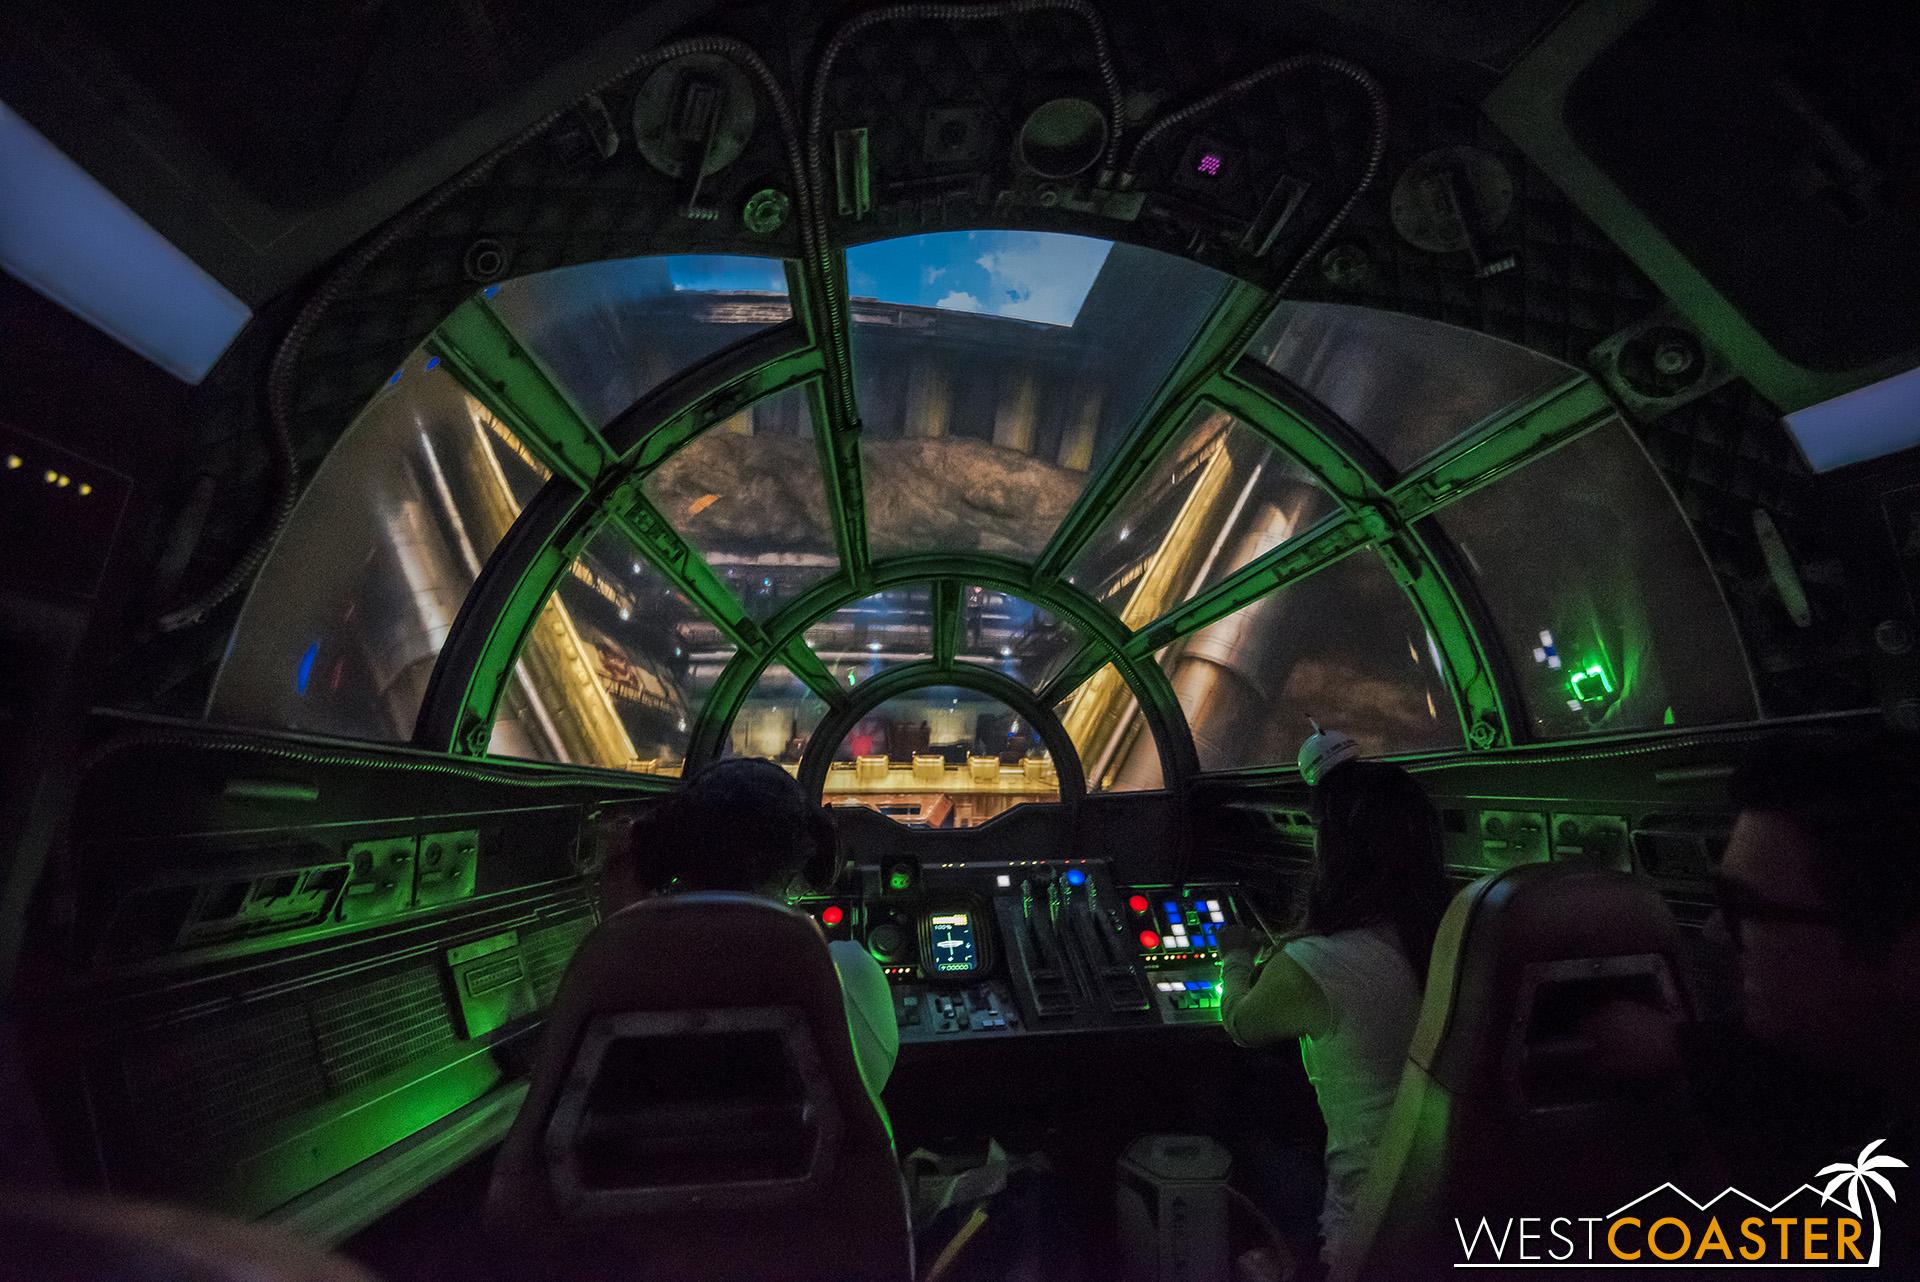 DLR-19_0606-D-Cockpit-0004.jpg